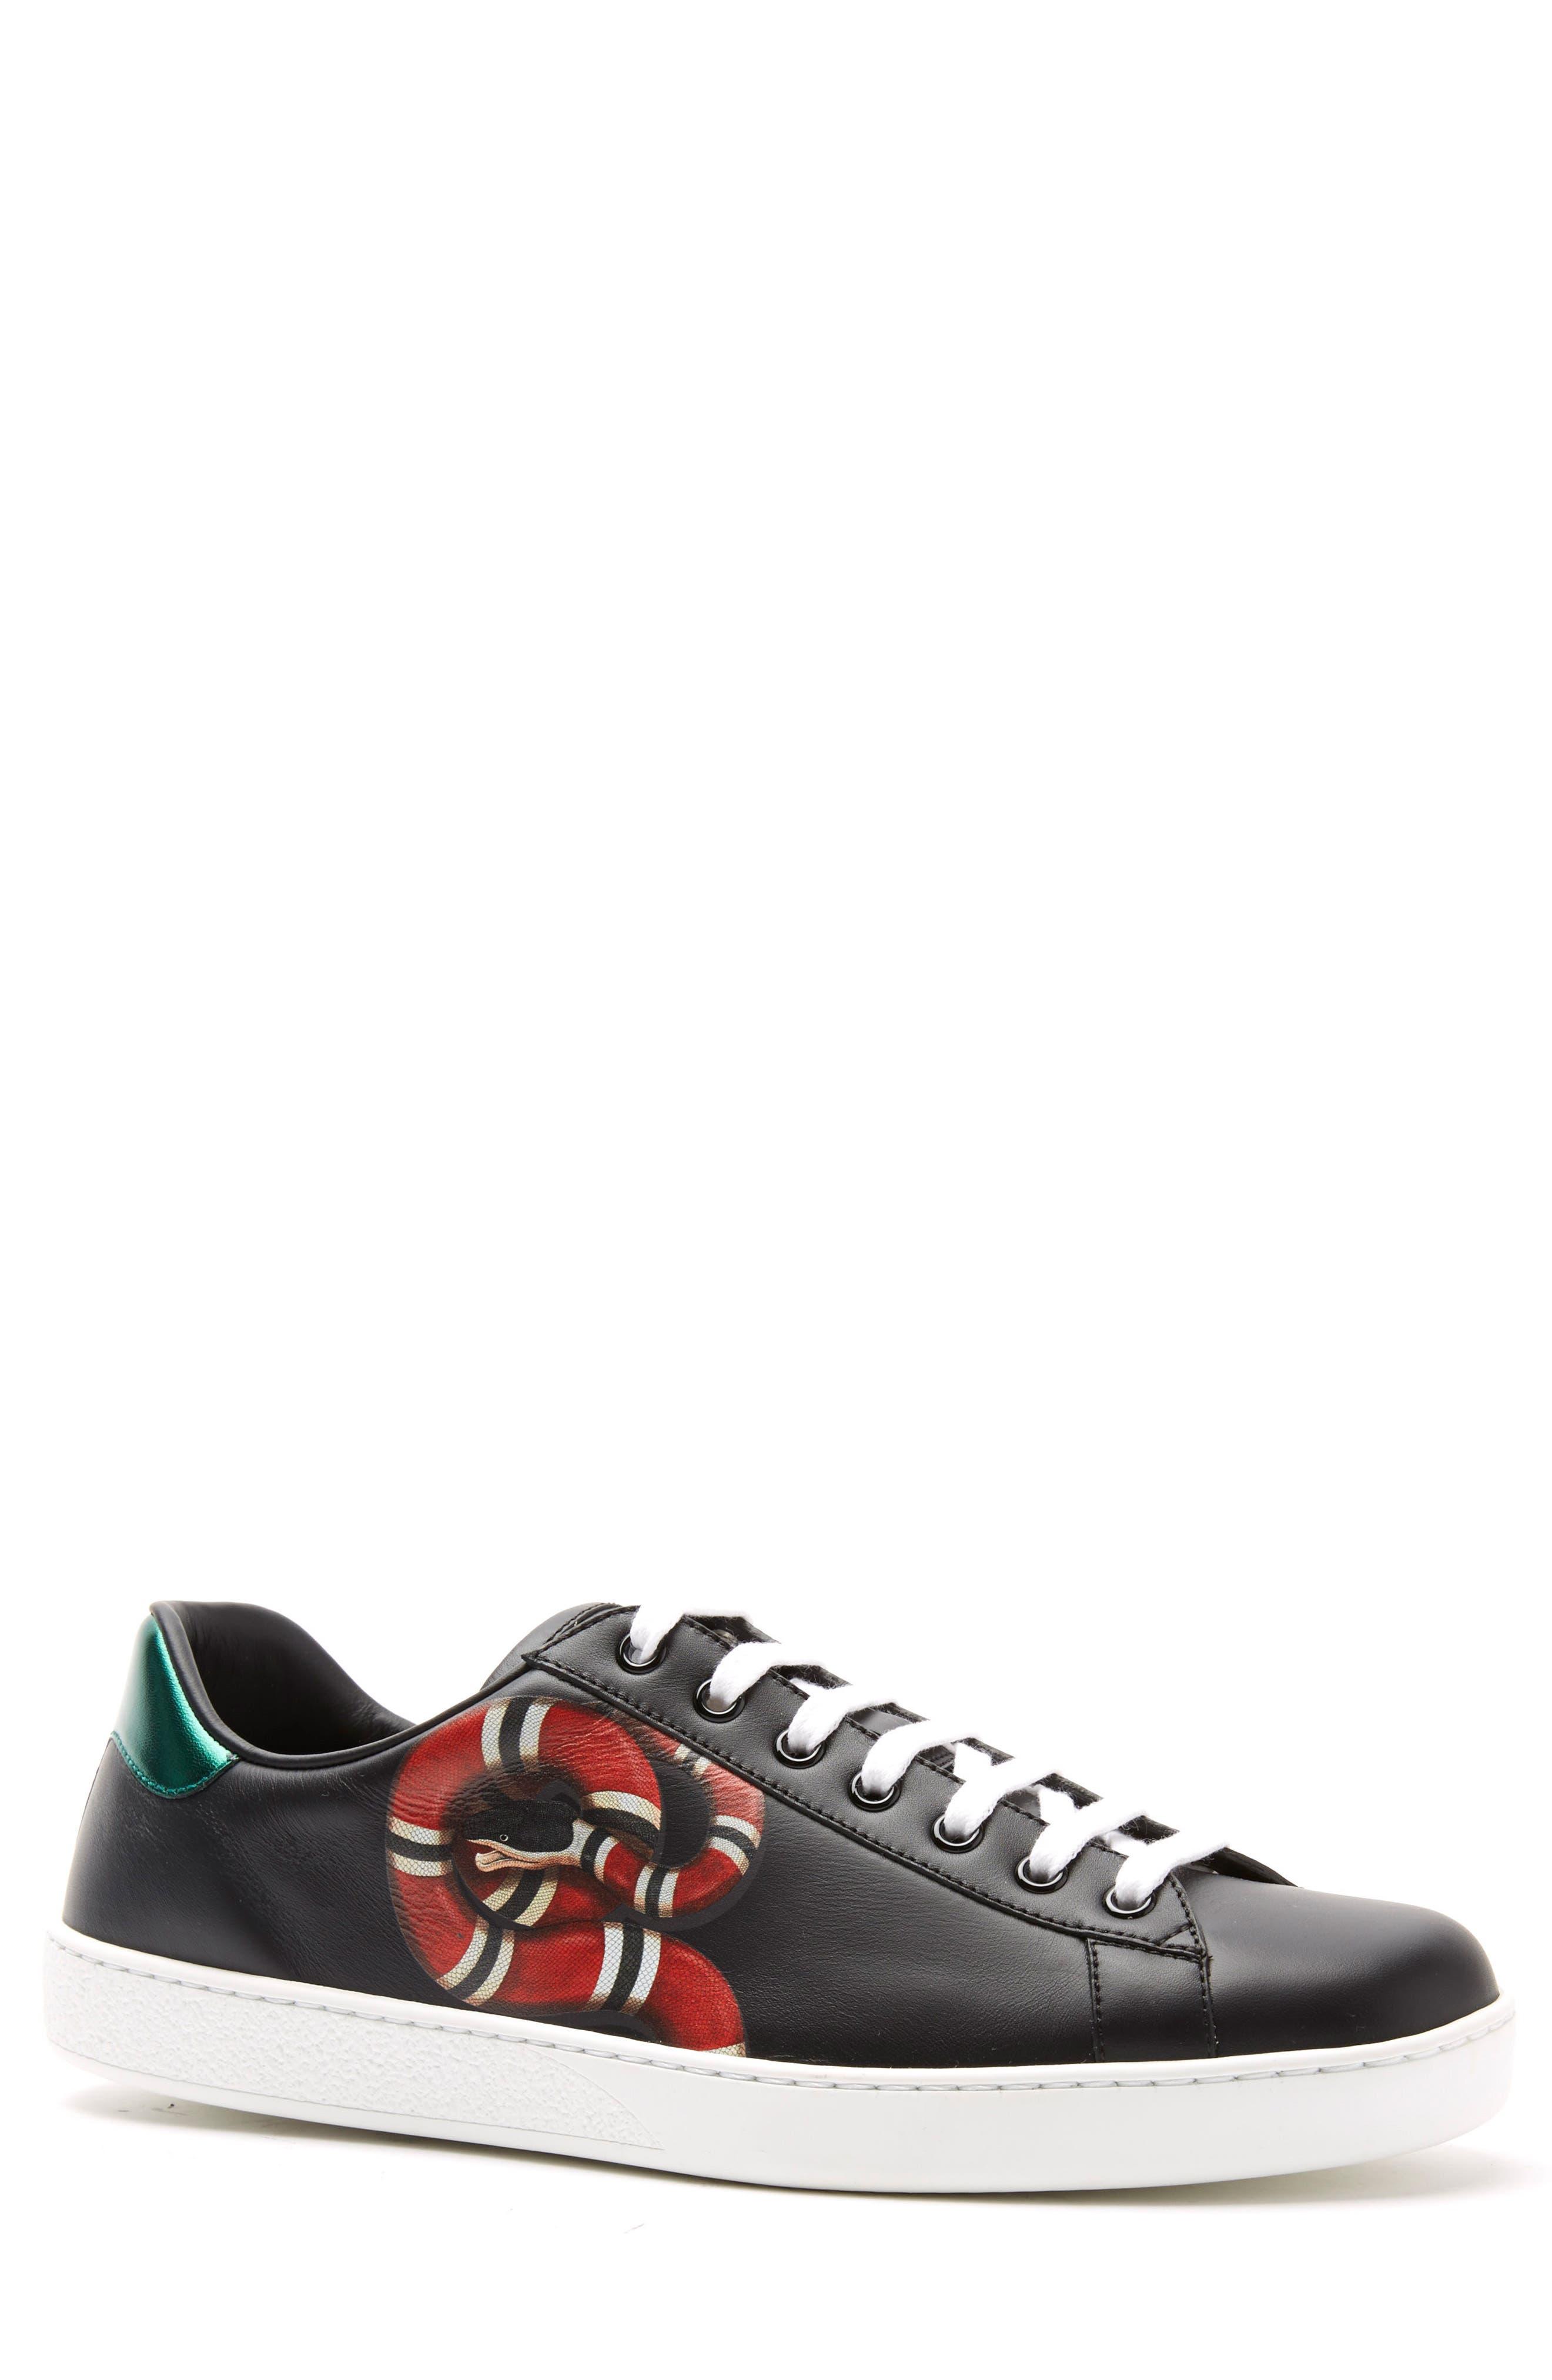 Gucci Mens New Ace Snake Loop Sneaker SBoMSlyqlN